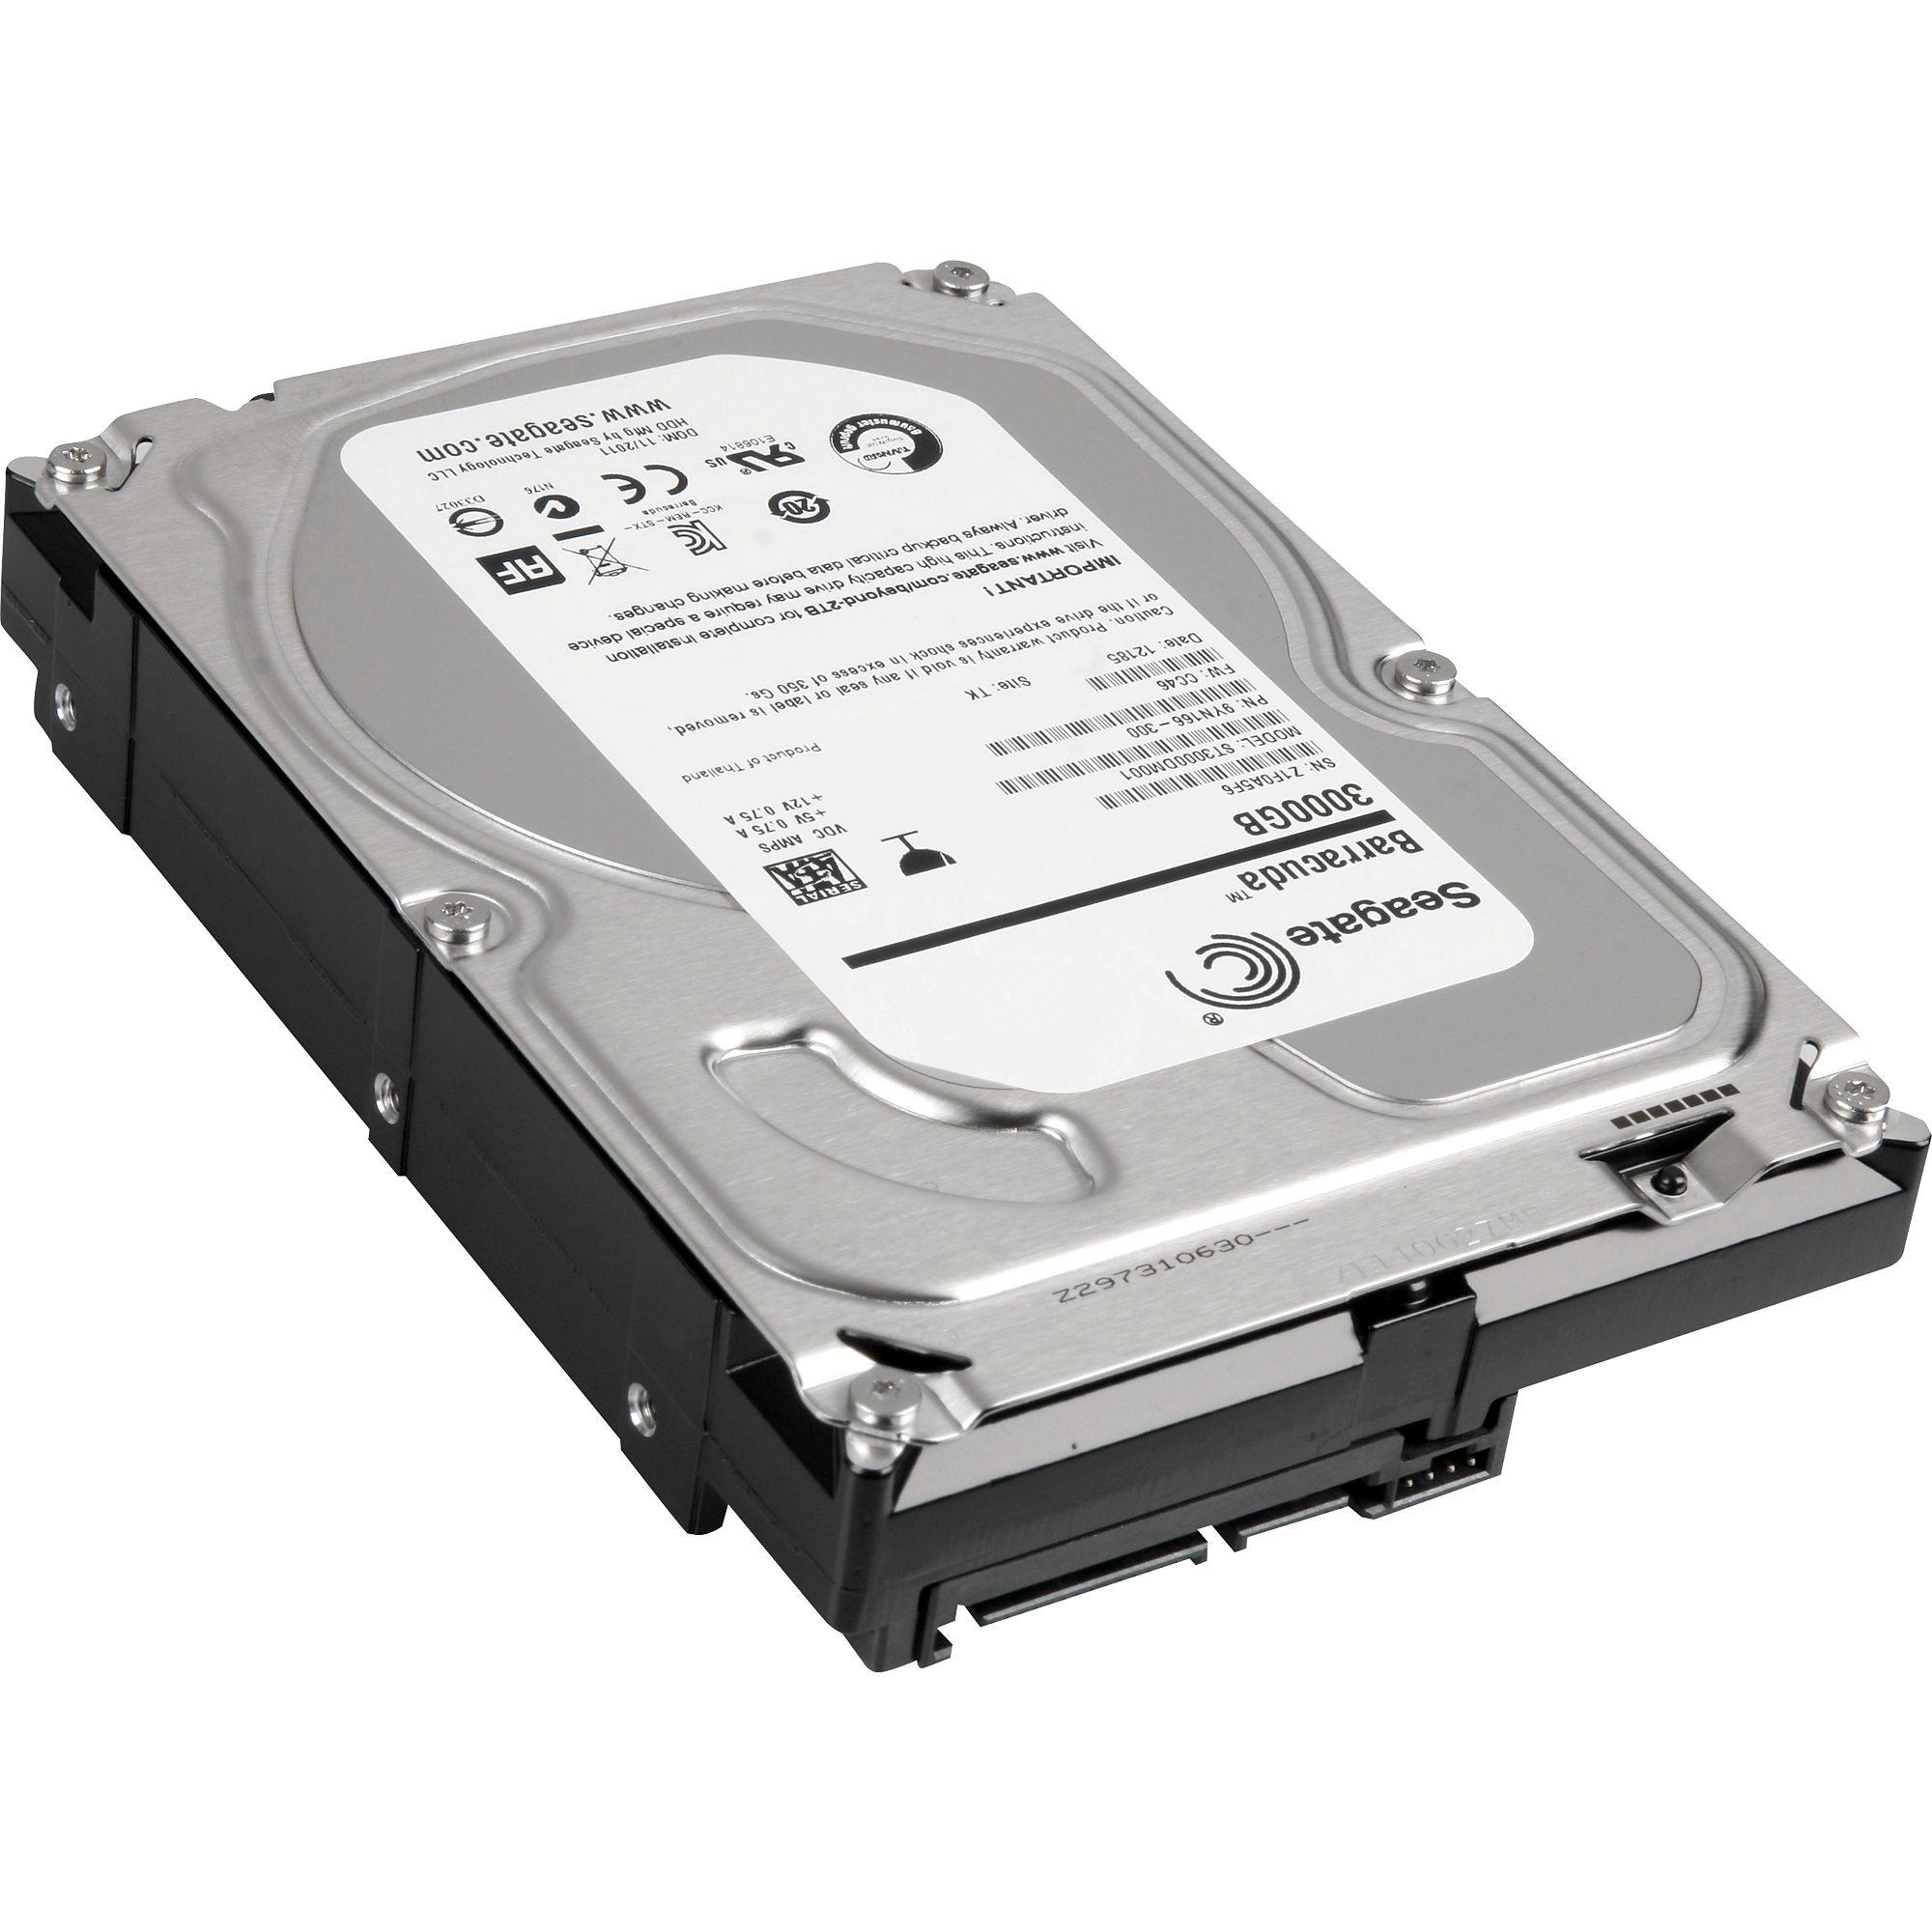 Seagate Festplatte »ST3000DM001 3 TB«